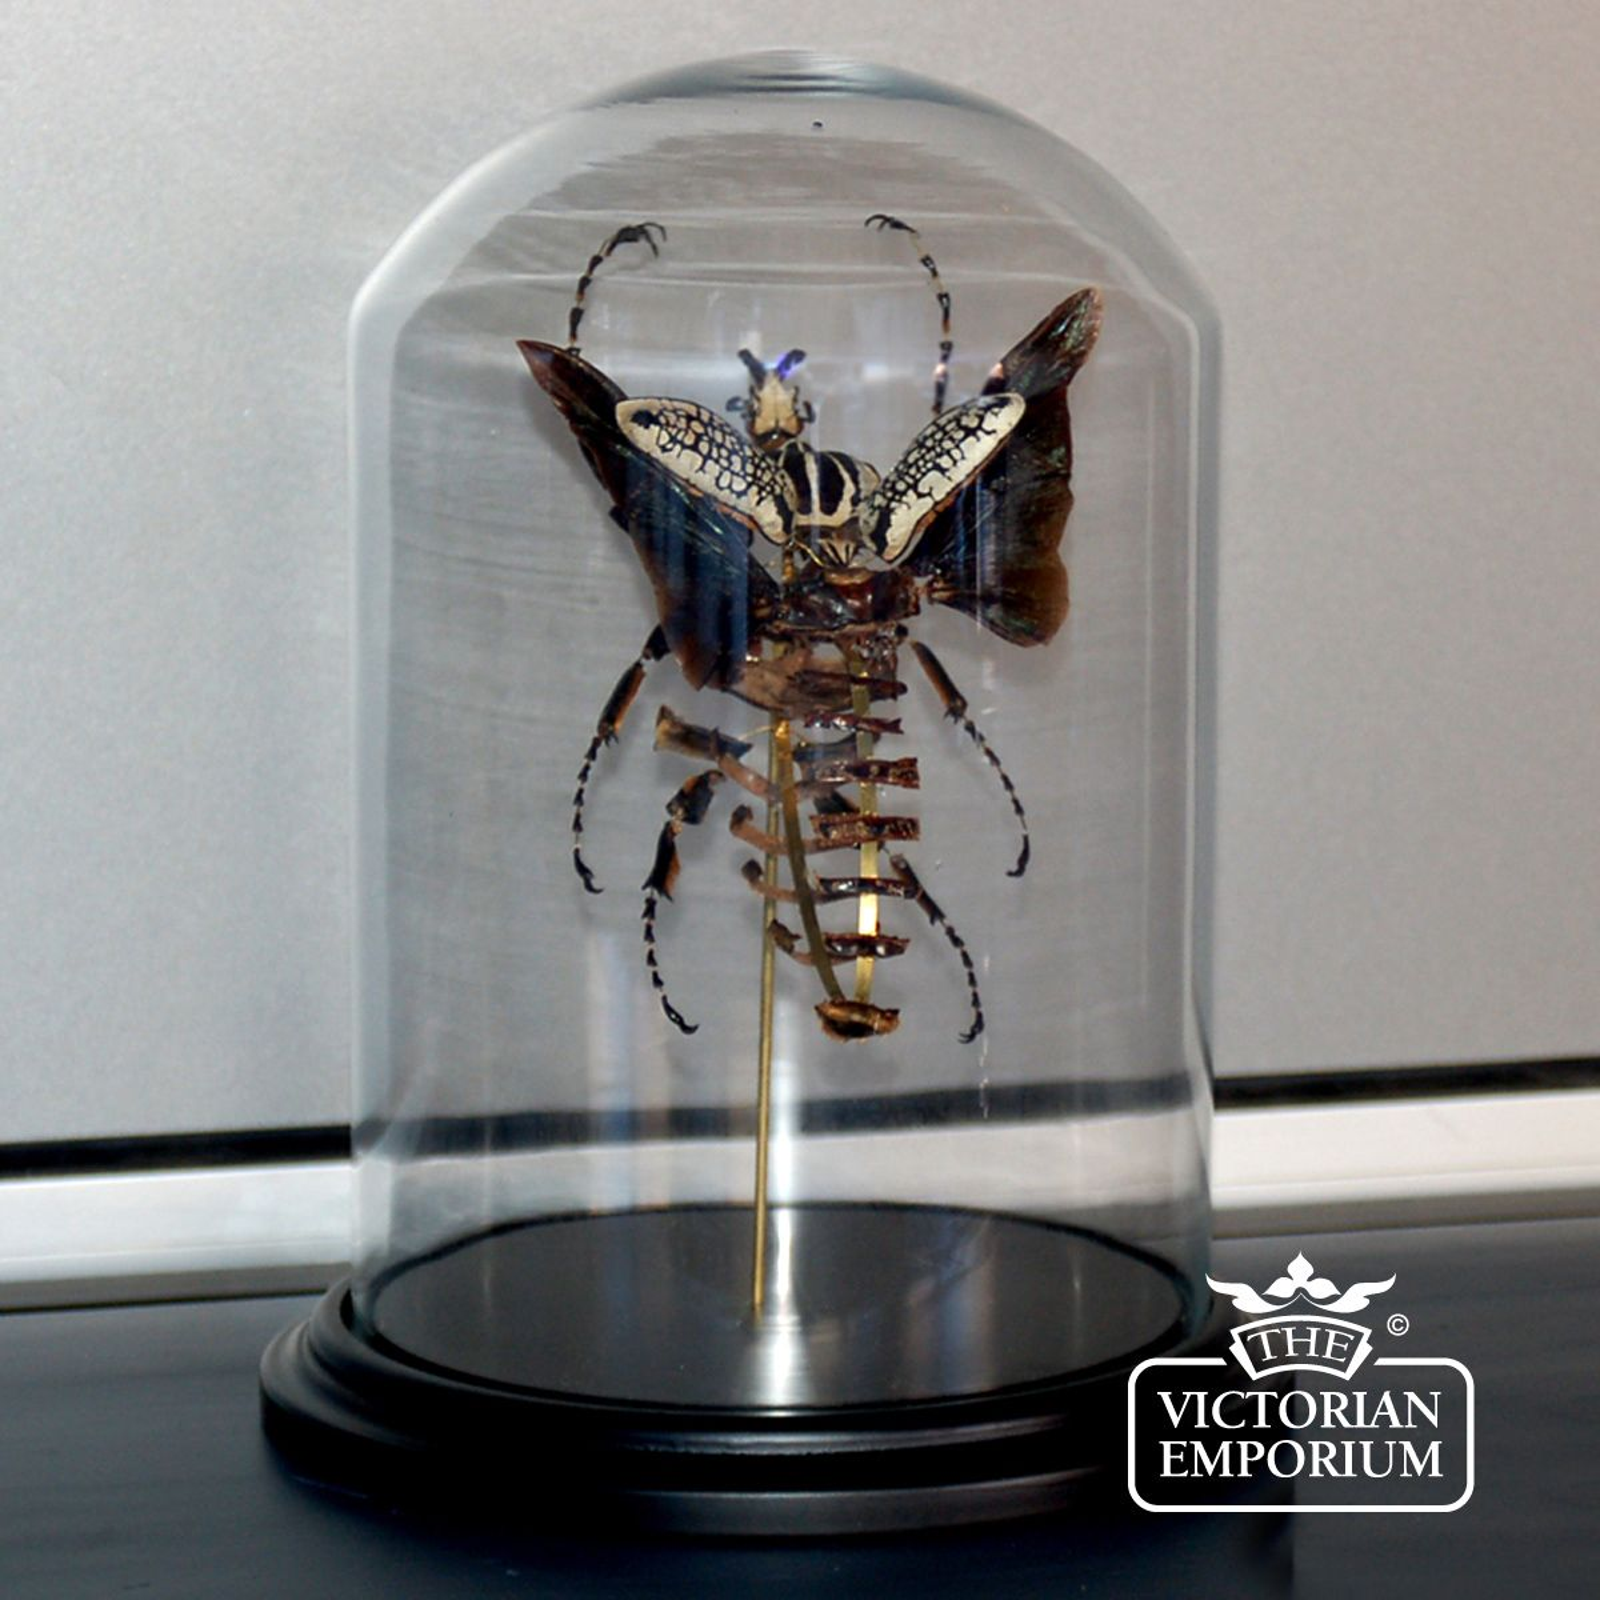 Decorative Display Cases Split Goliathus Under Glass Dome Natural Curiosities